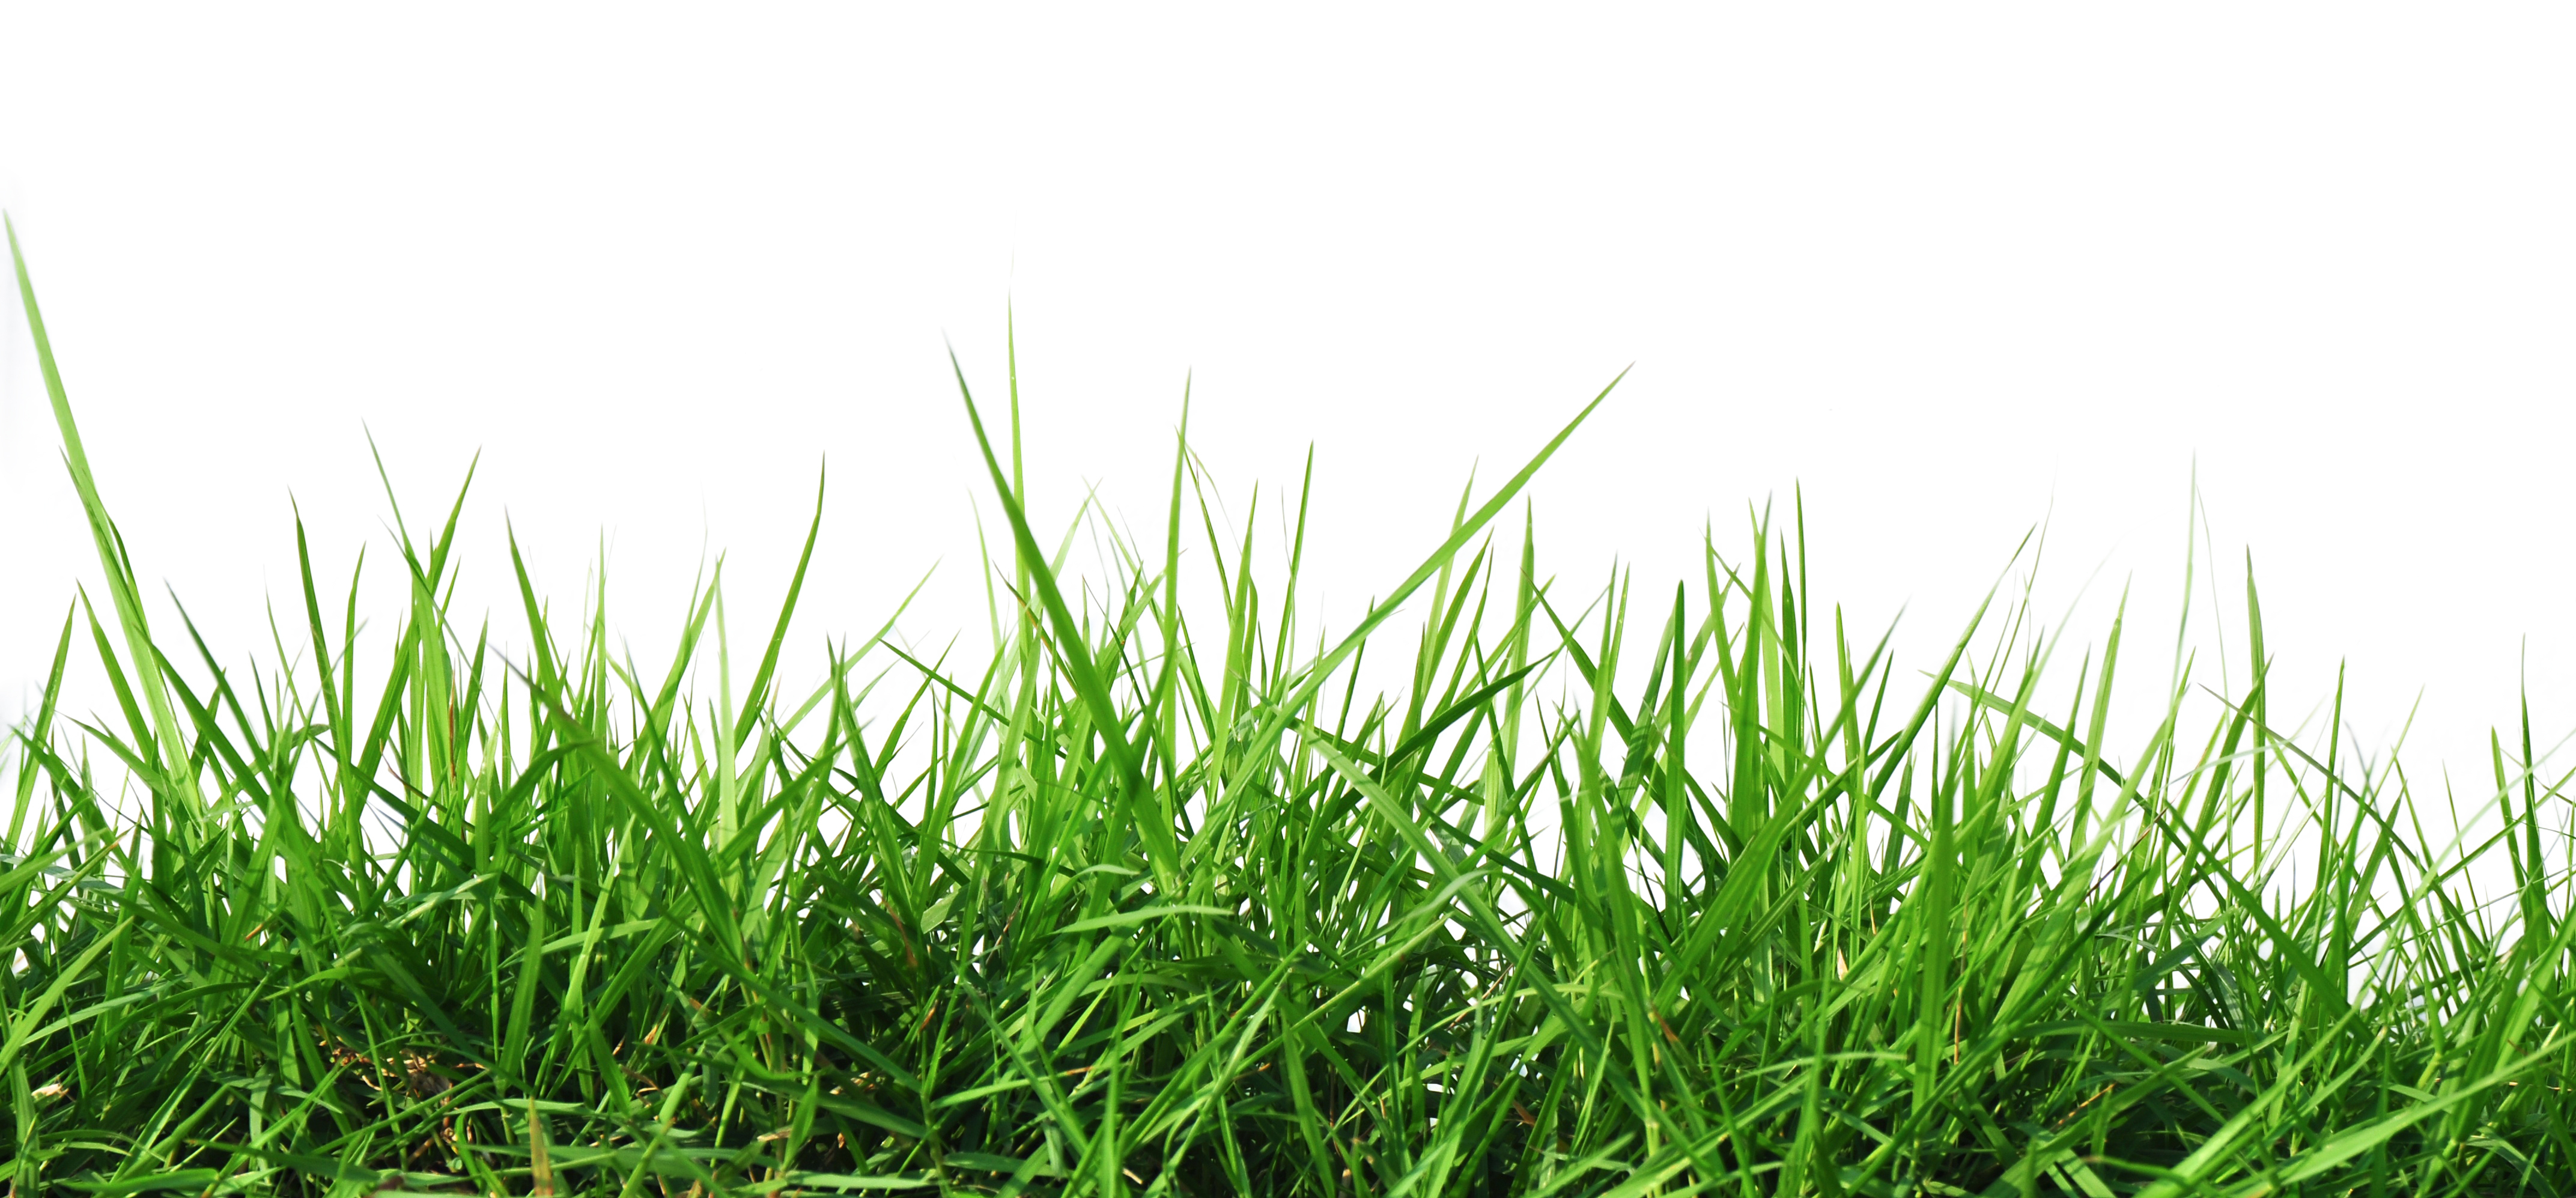 Grass HD PNG - 119874